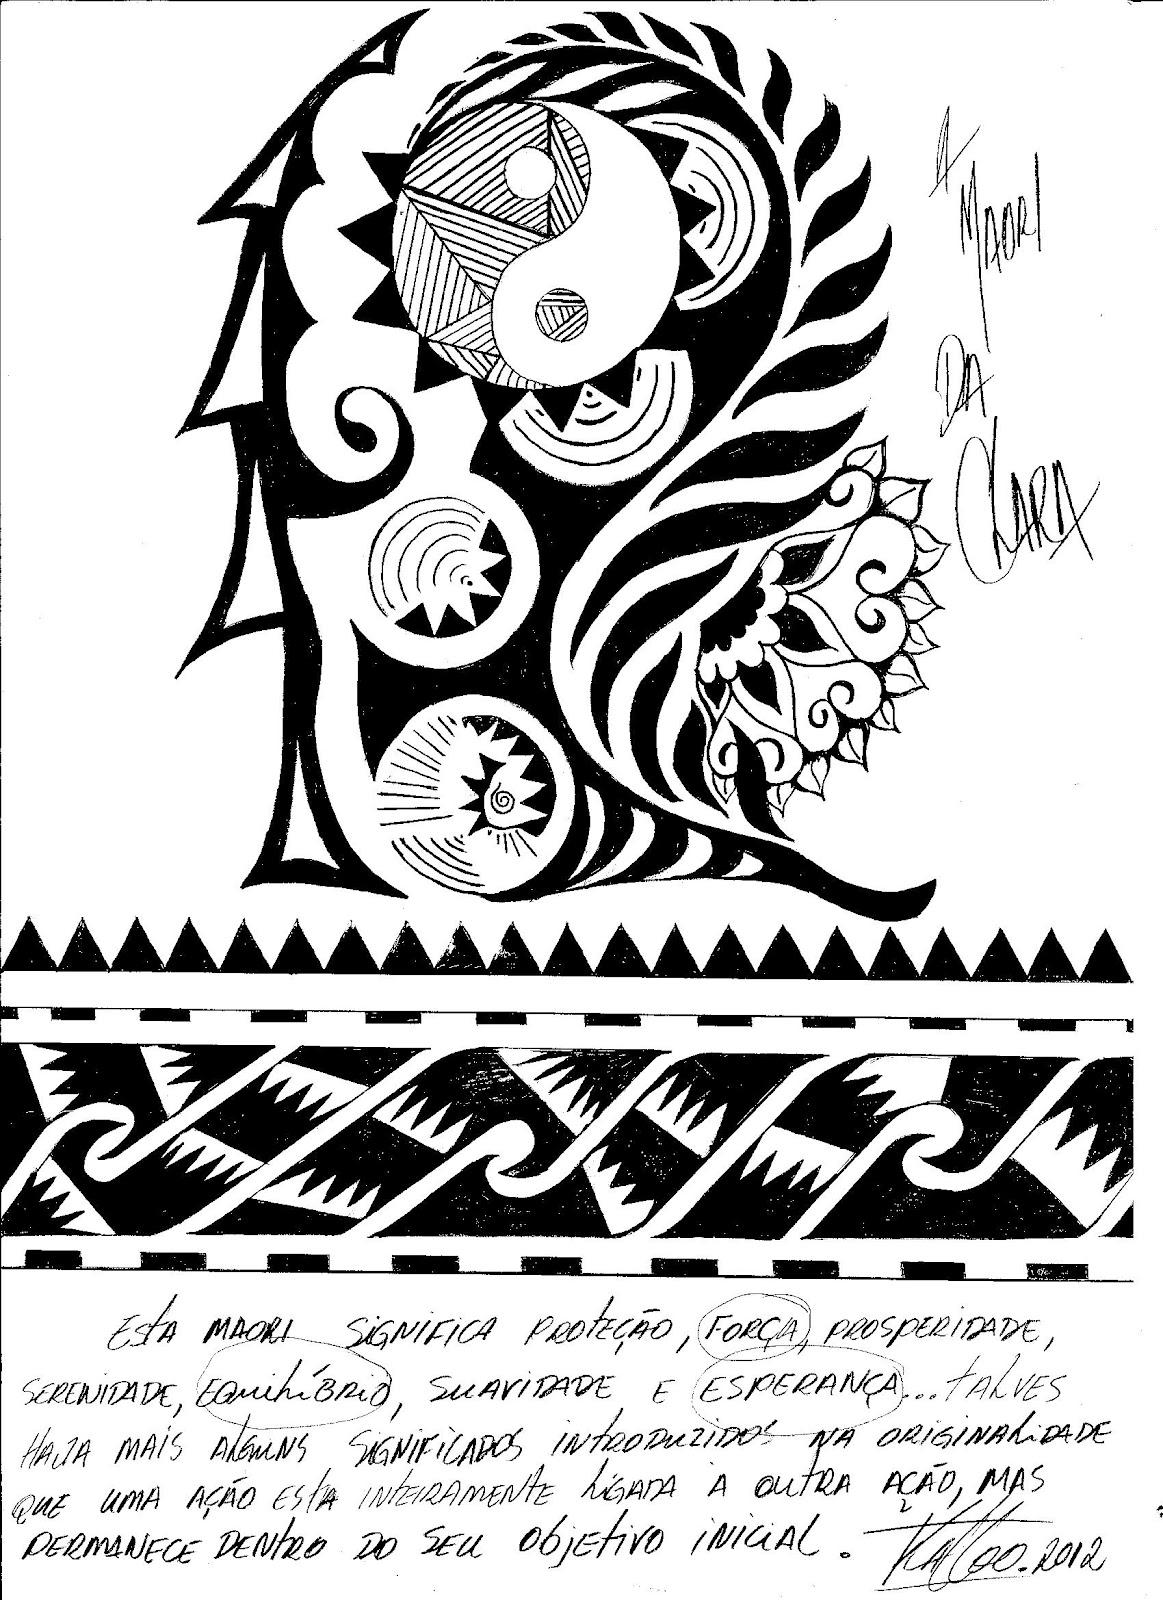 Favoritos Kattoo Ink: Maori de Karina OM52